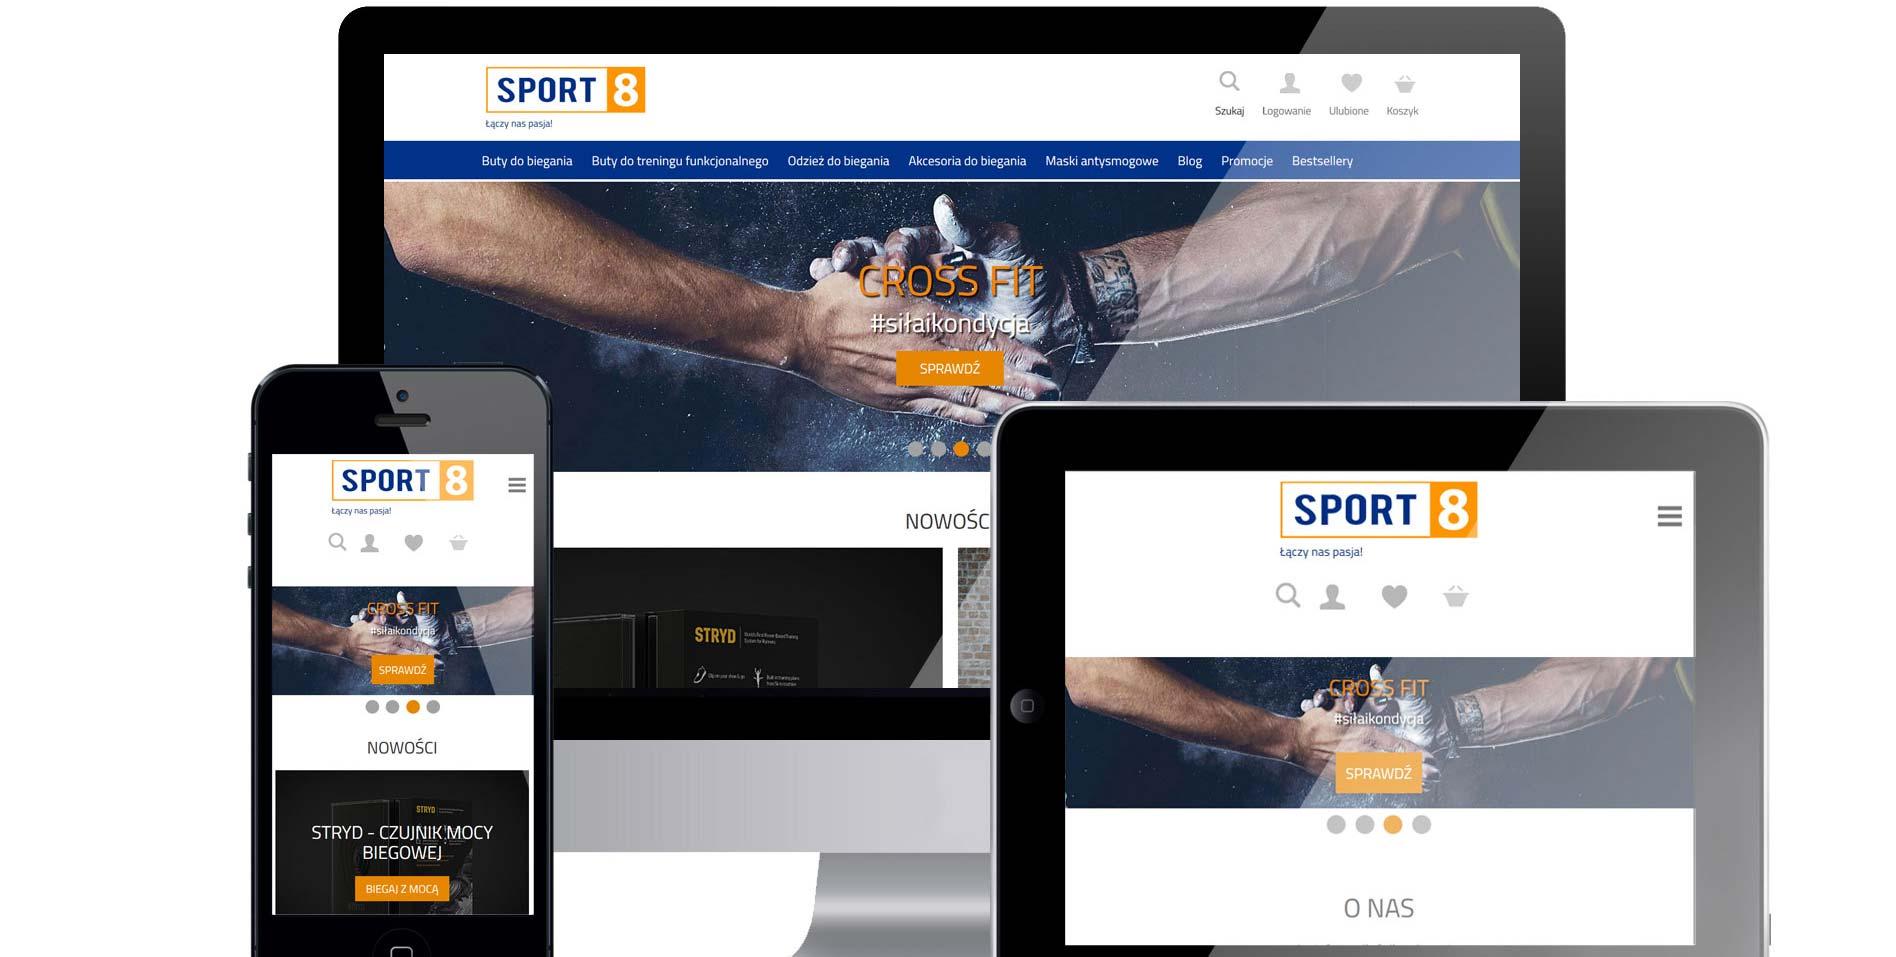 8256d1726de1d8 Wirtualizer - system E-commerce ERP, sklepy internetowe, automatyzacja